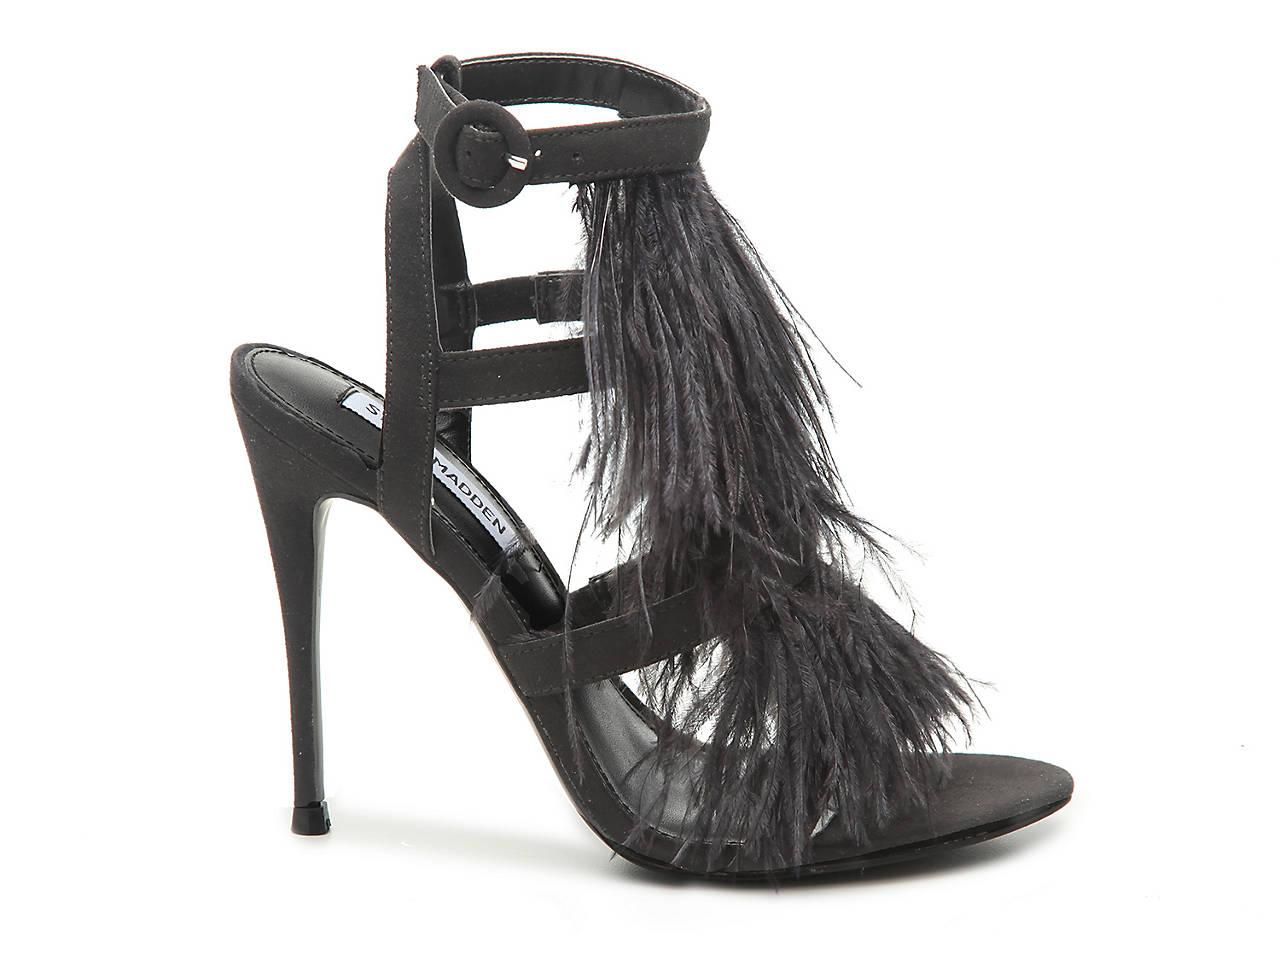 208eb04fa2bc1 Steve Madden Fefe Sandal Women s Shoes